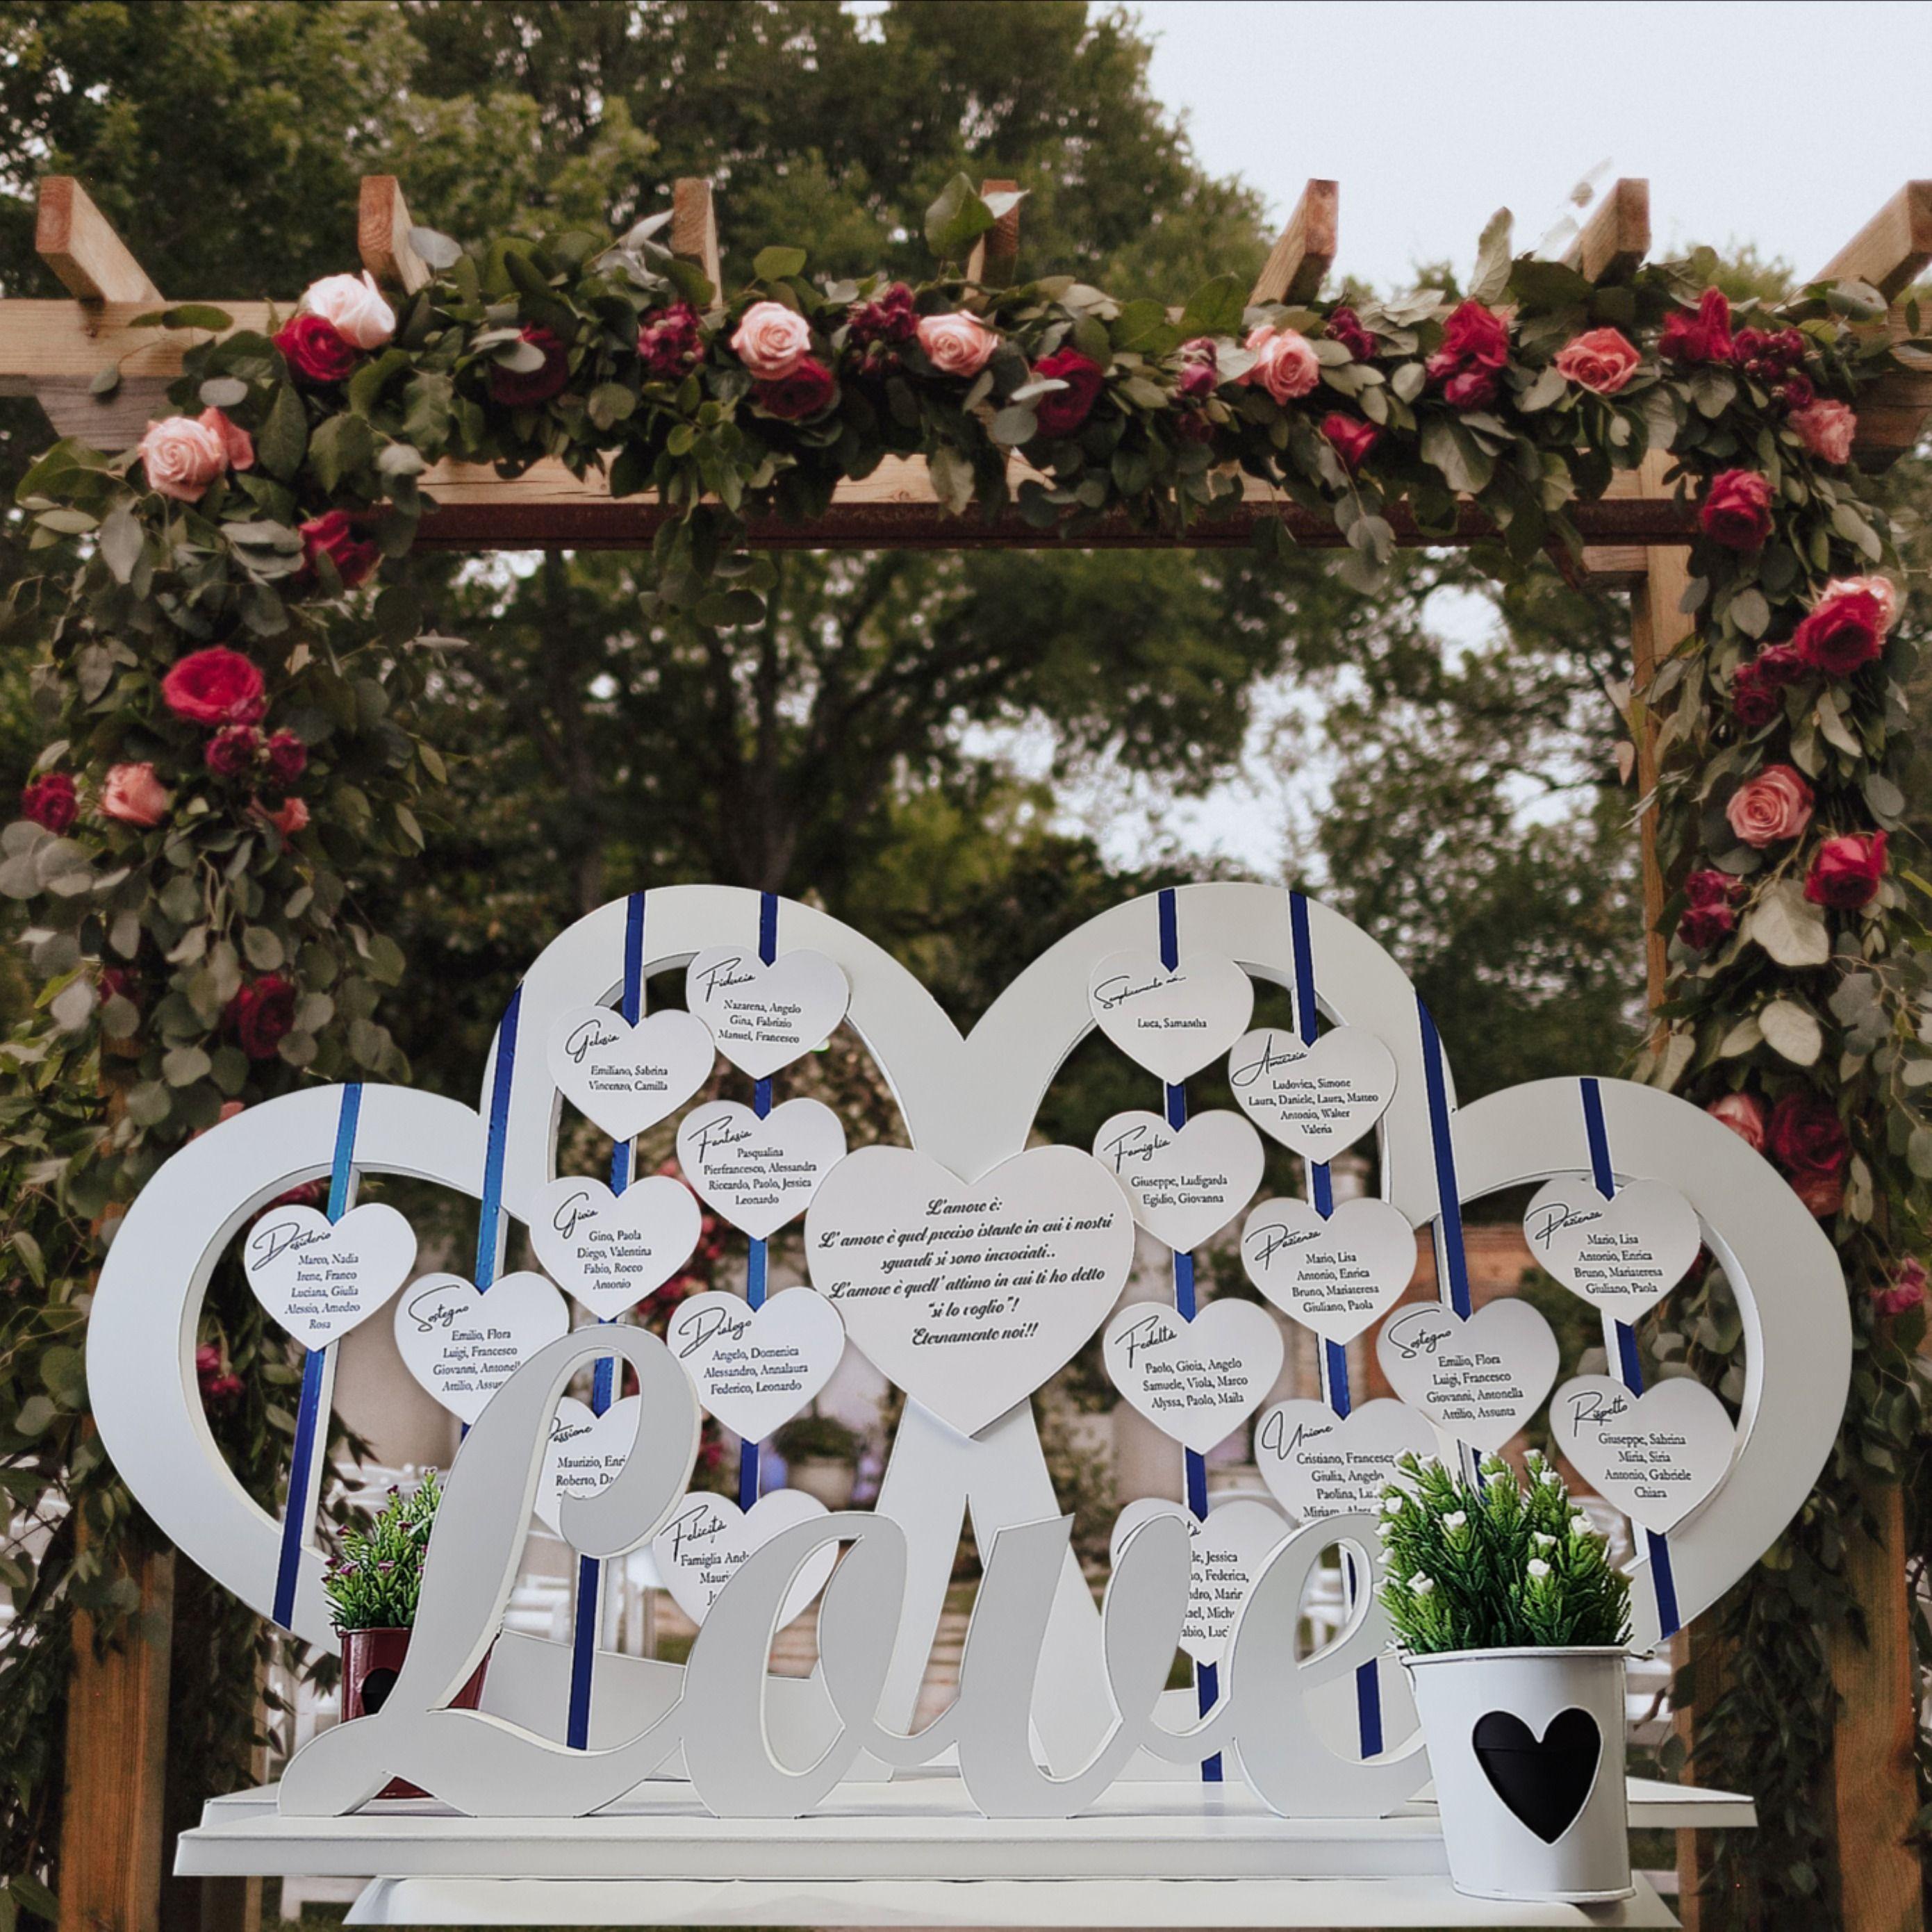 Tableau Tema Amore Nel 2020 Tableau Matrimonio Matrimonio Tema